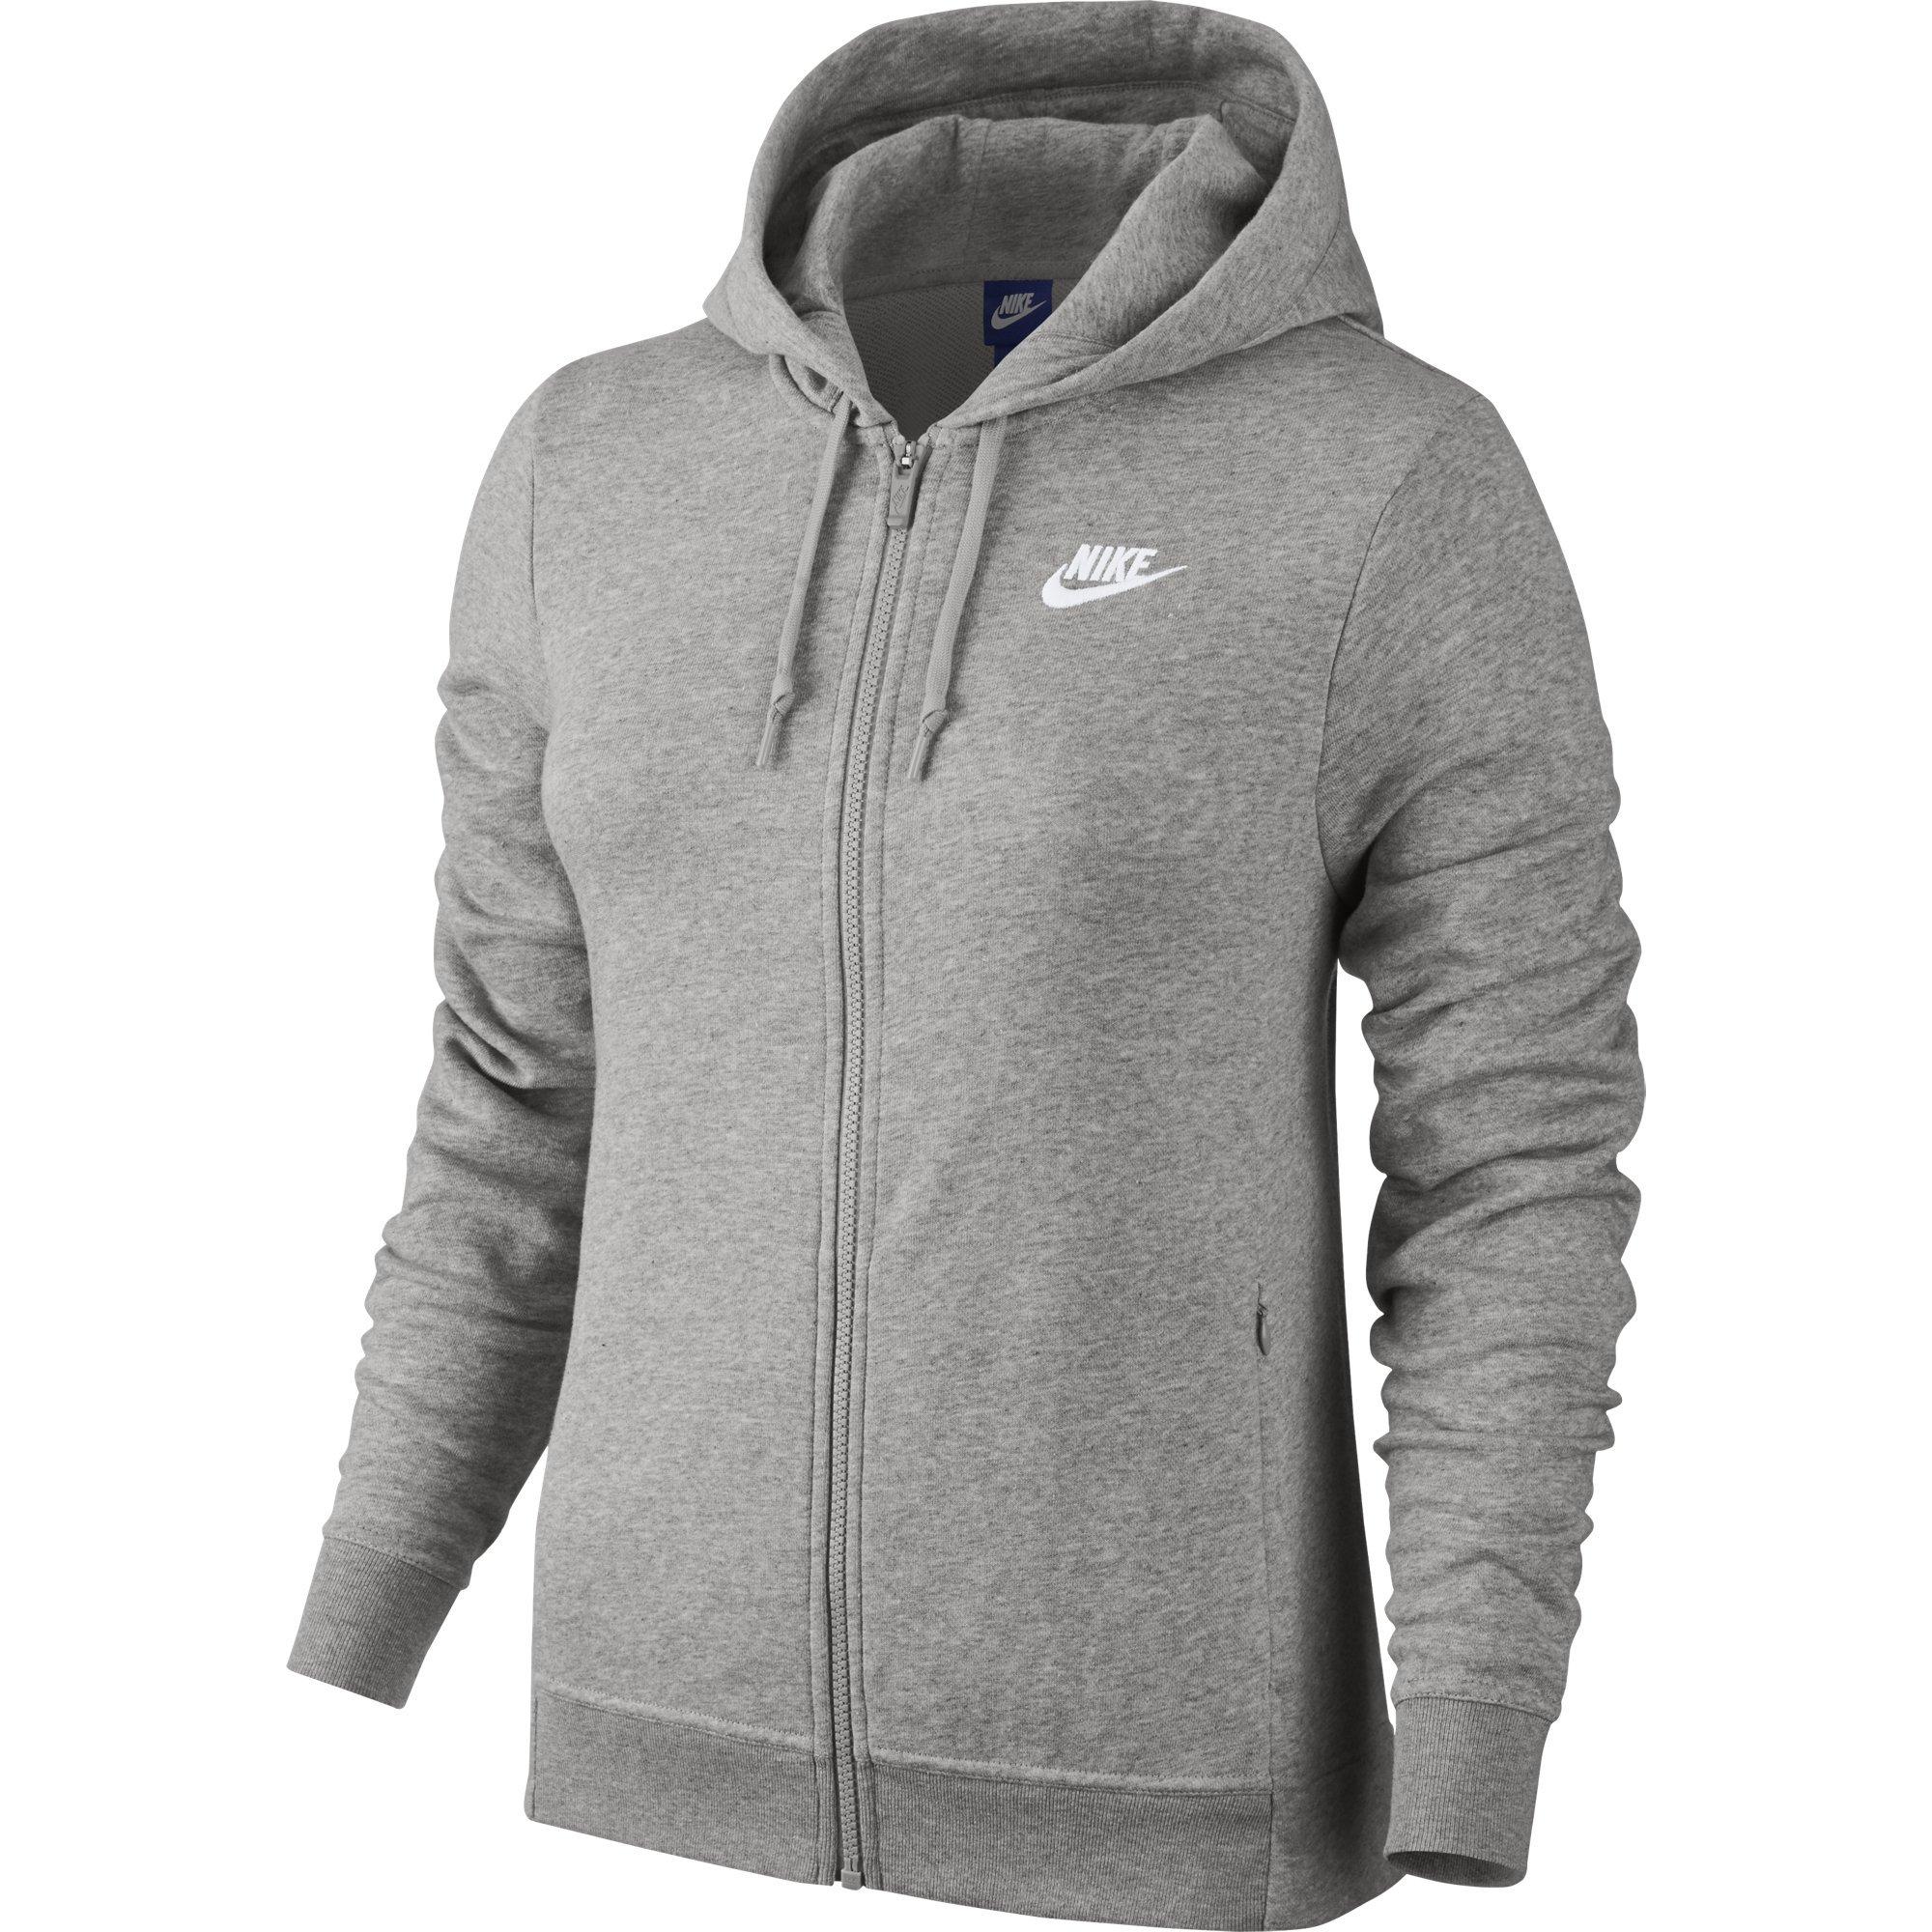 NIKE Sportswear Women's Full Zip Hoodie, Dark Grey Heather/Dark Grey Heather/White, Medium